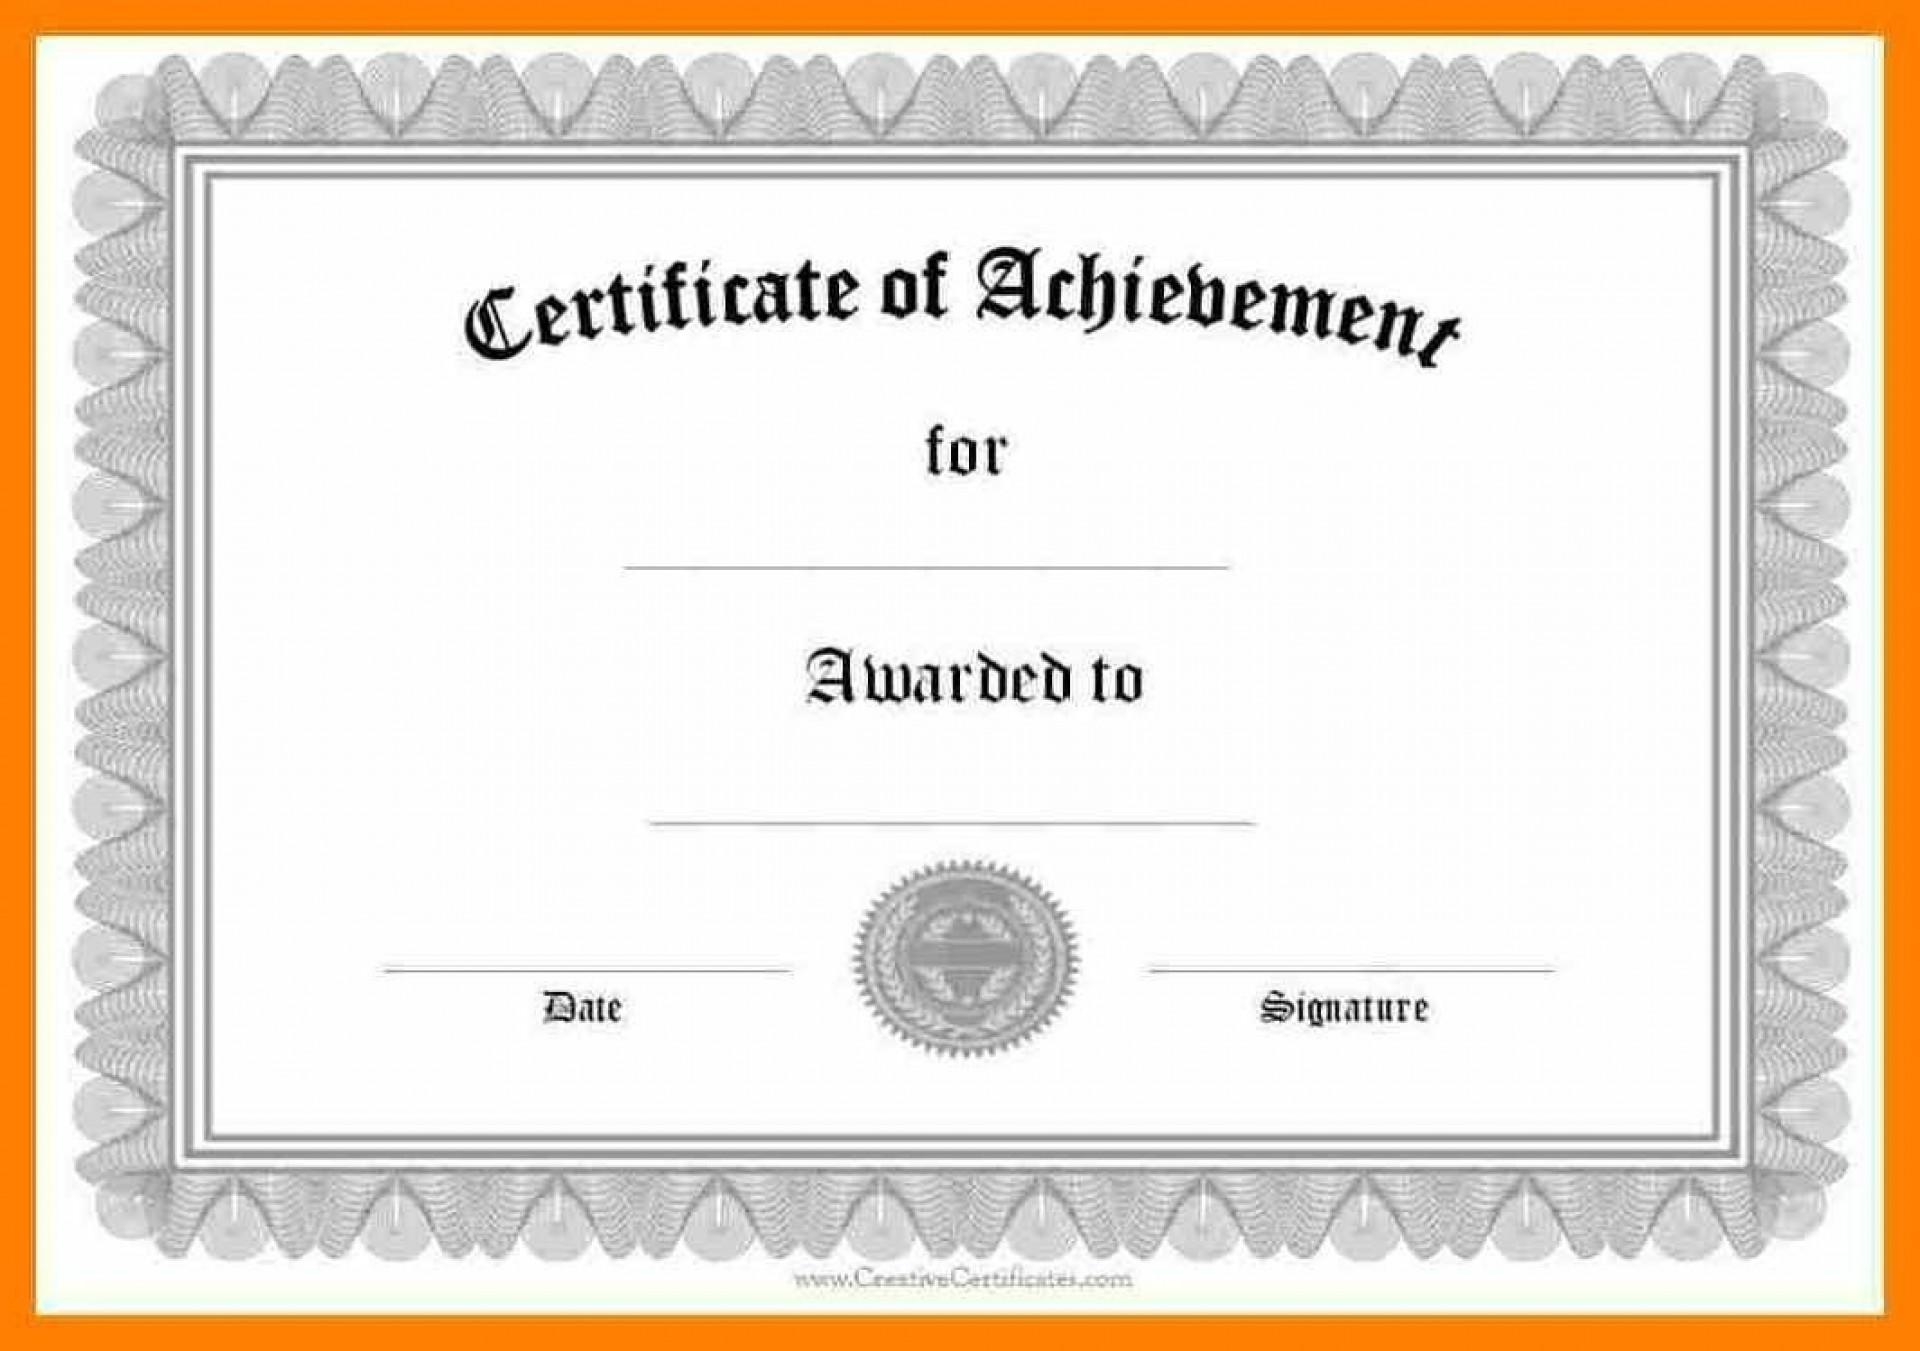 006 Wondrou Certificate Of Award Template Word Free High Def 1920